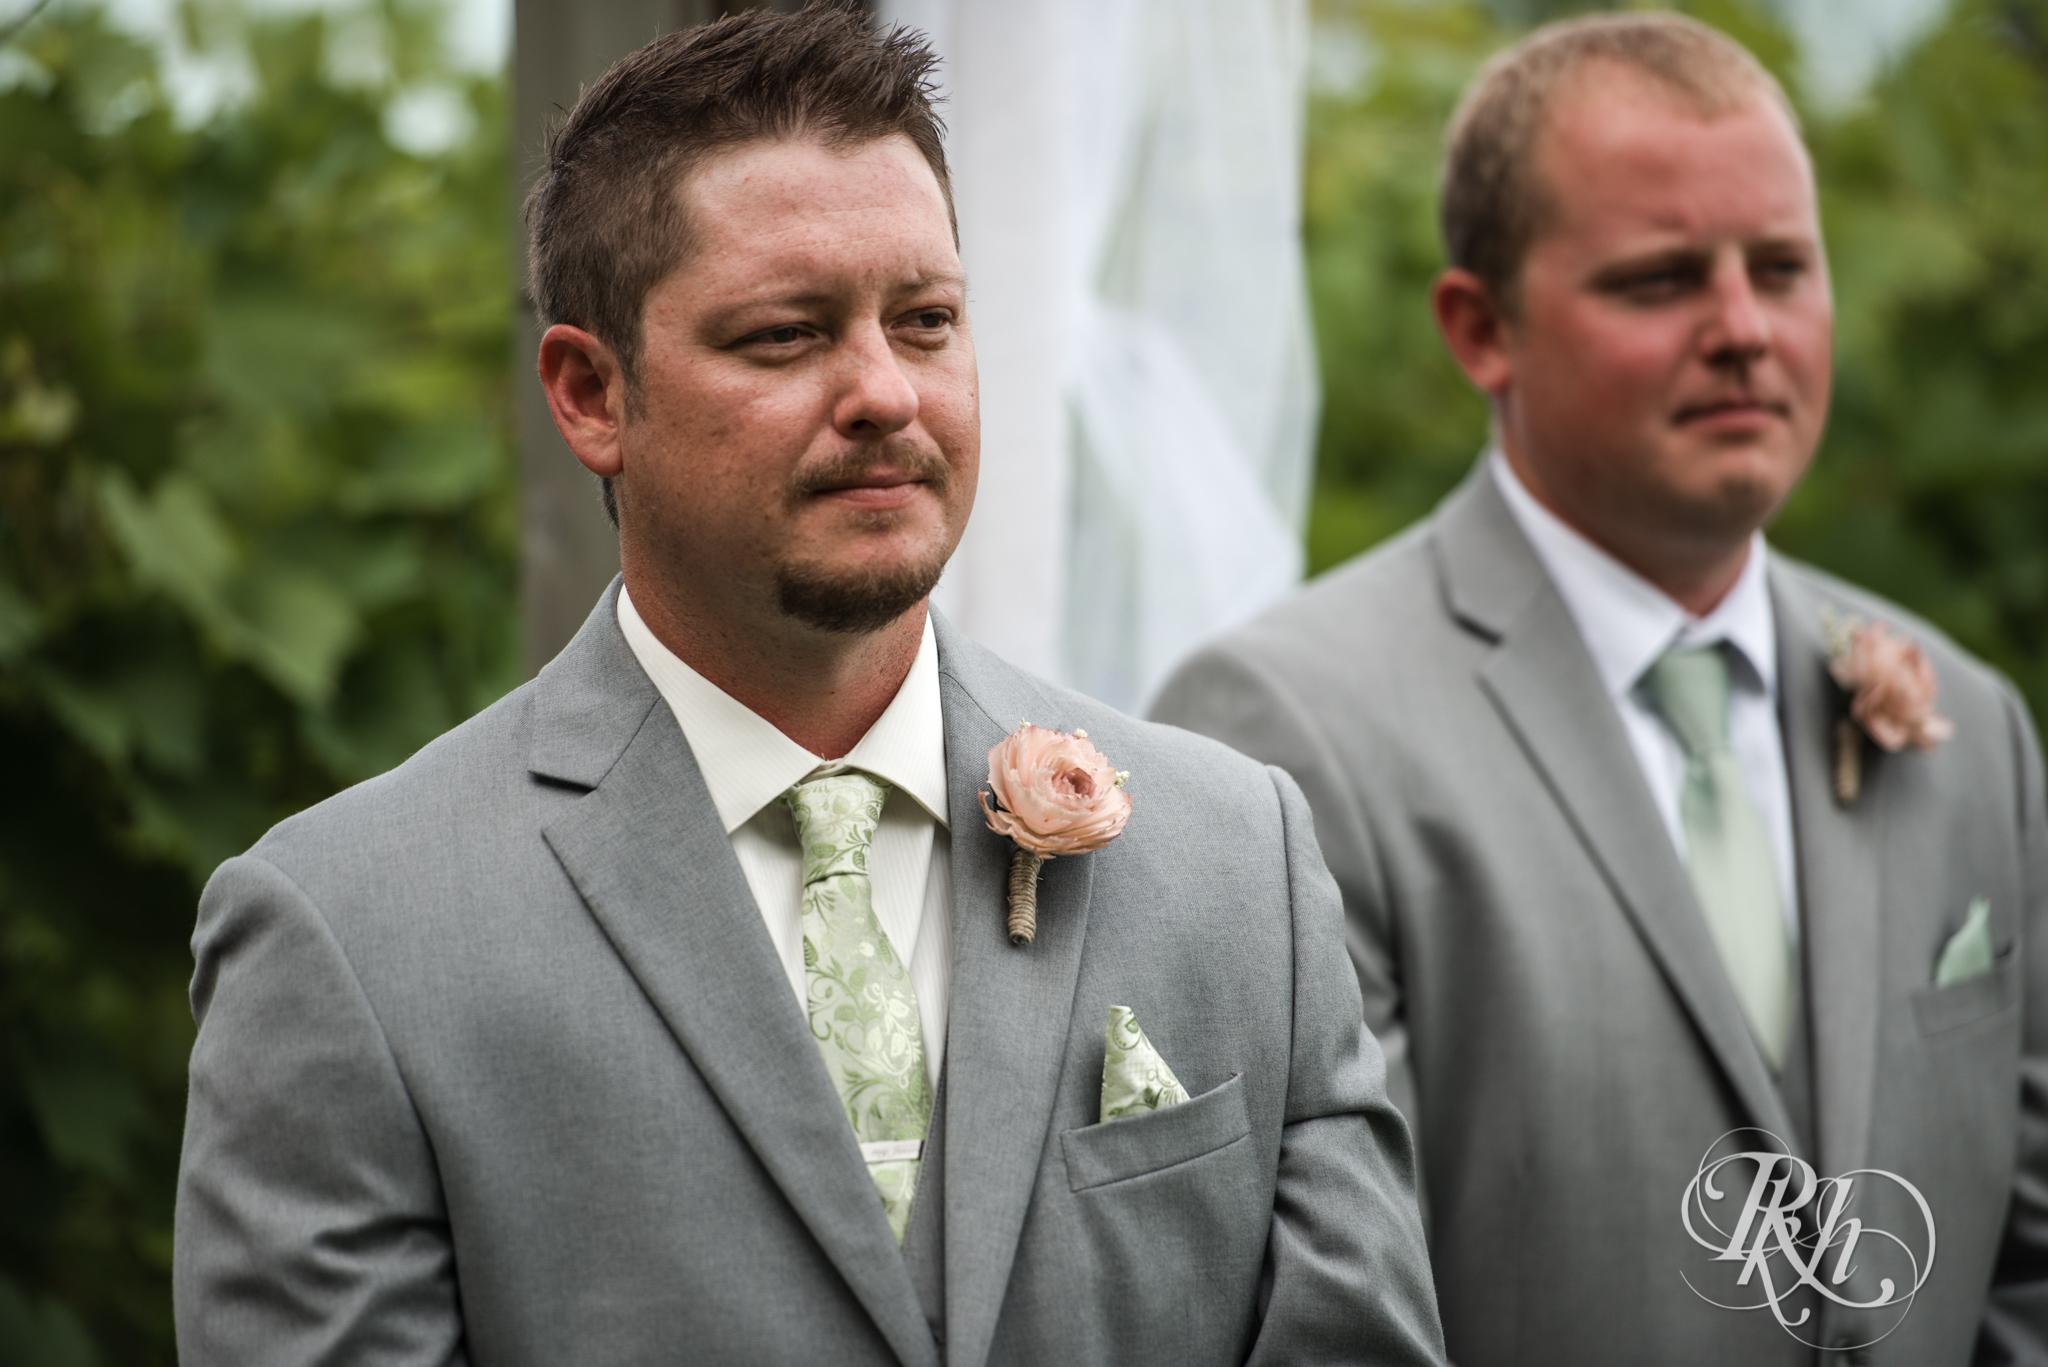 Ally & Nick - Minnesota Wedding Photography - Next Chapter Winery - RKH Images - Blog (15 of 57).jpg